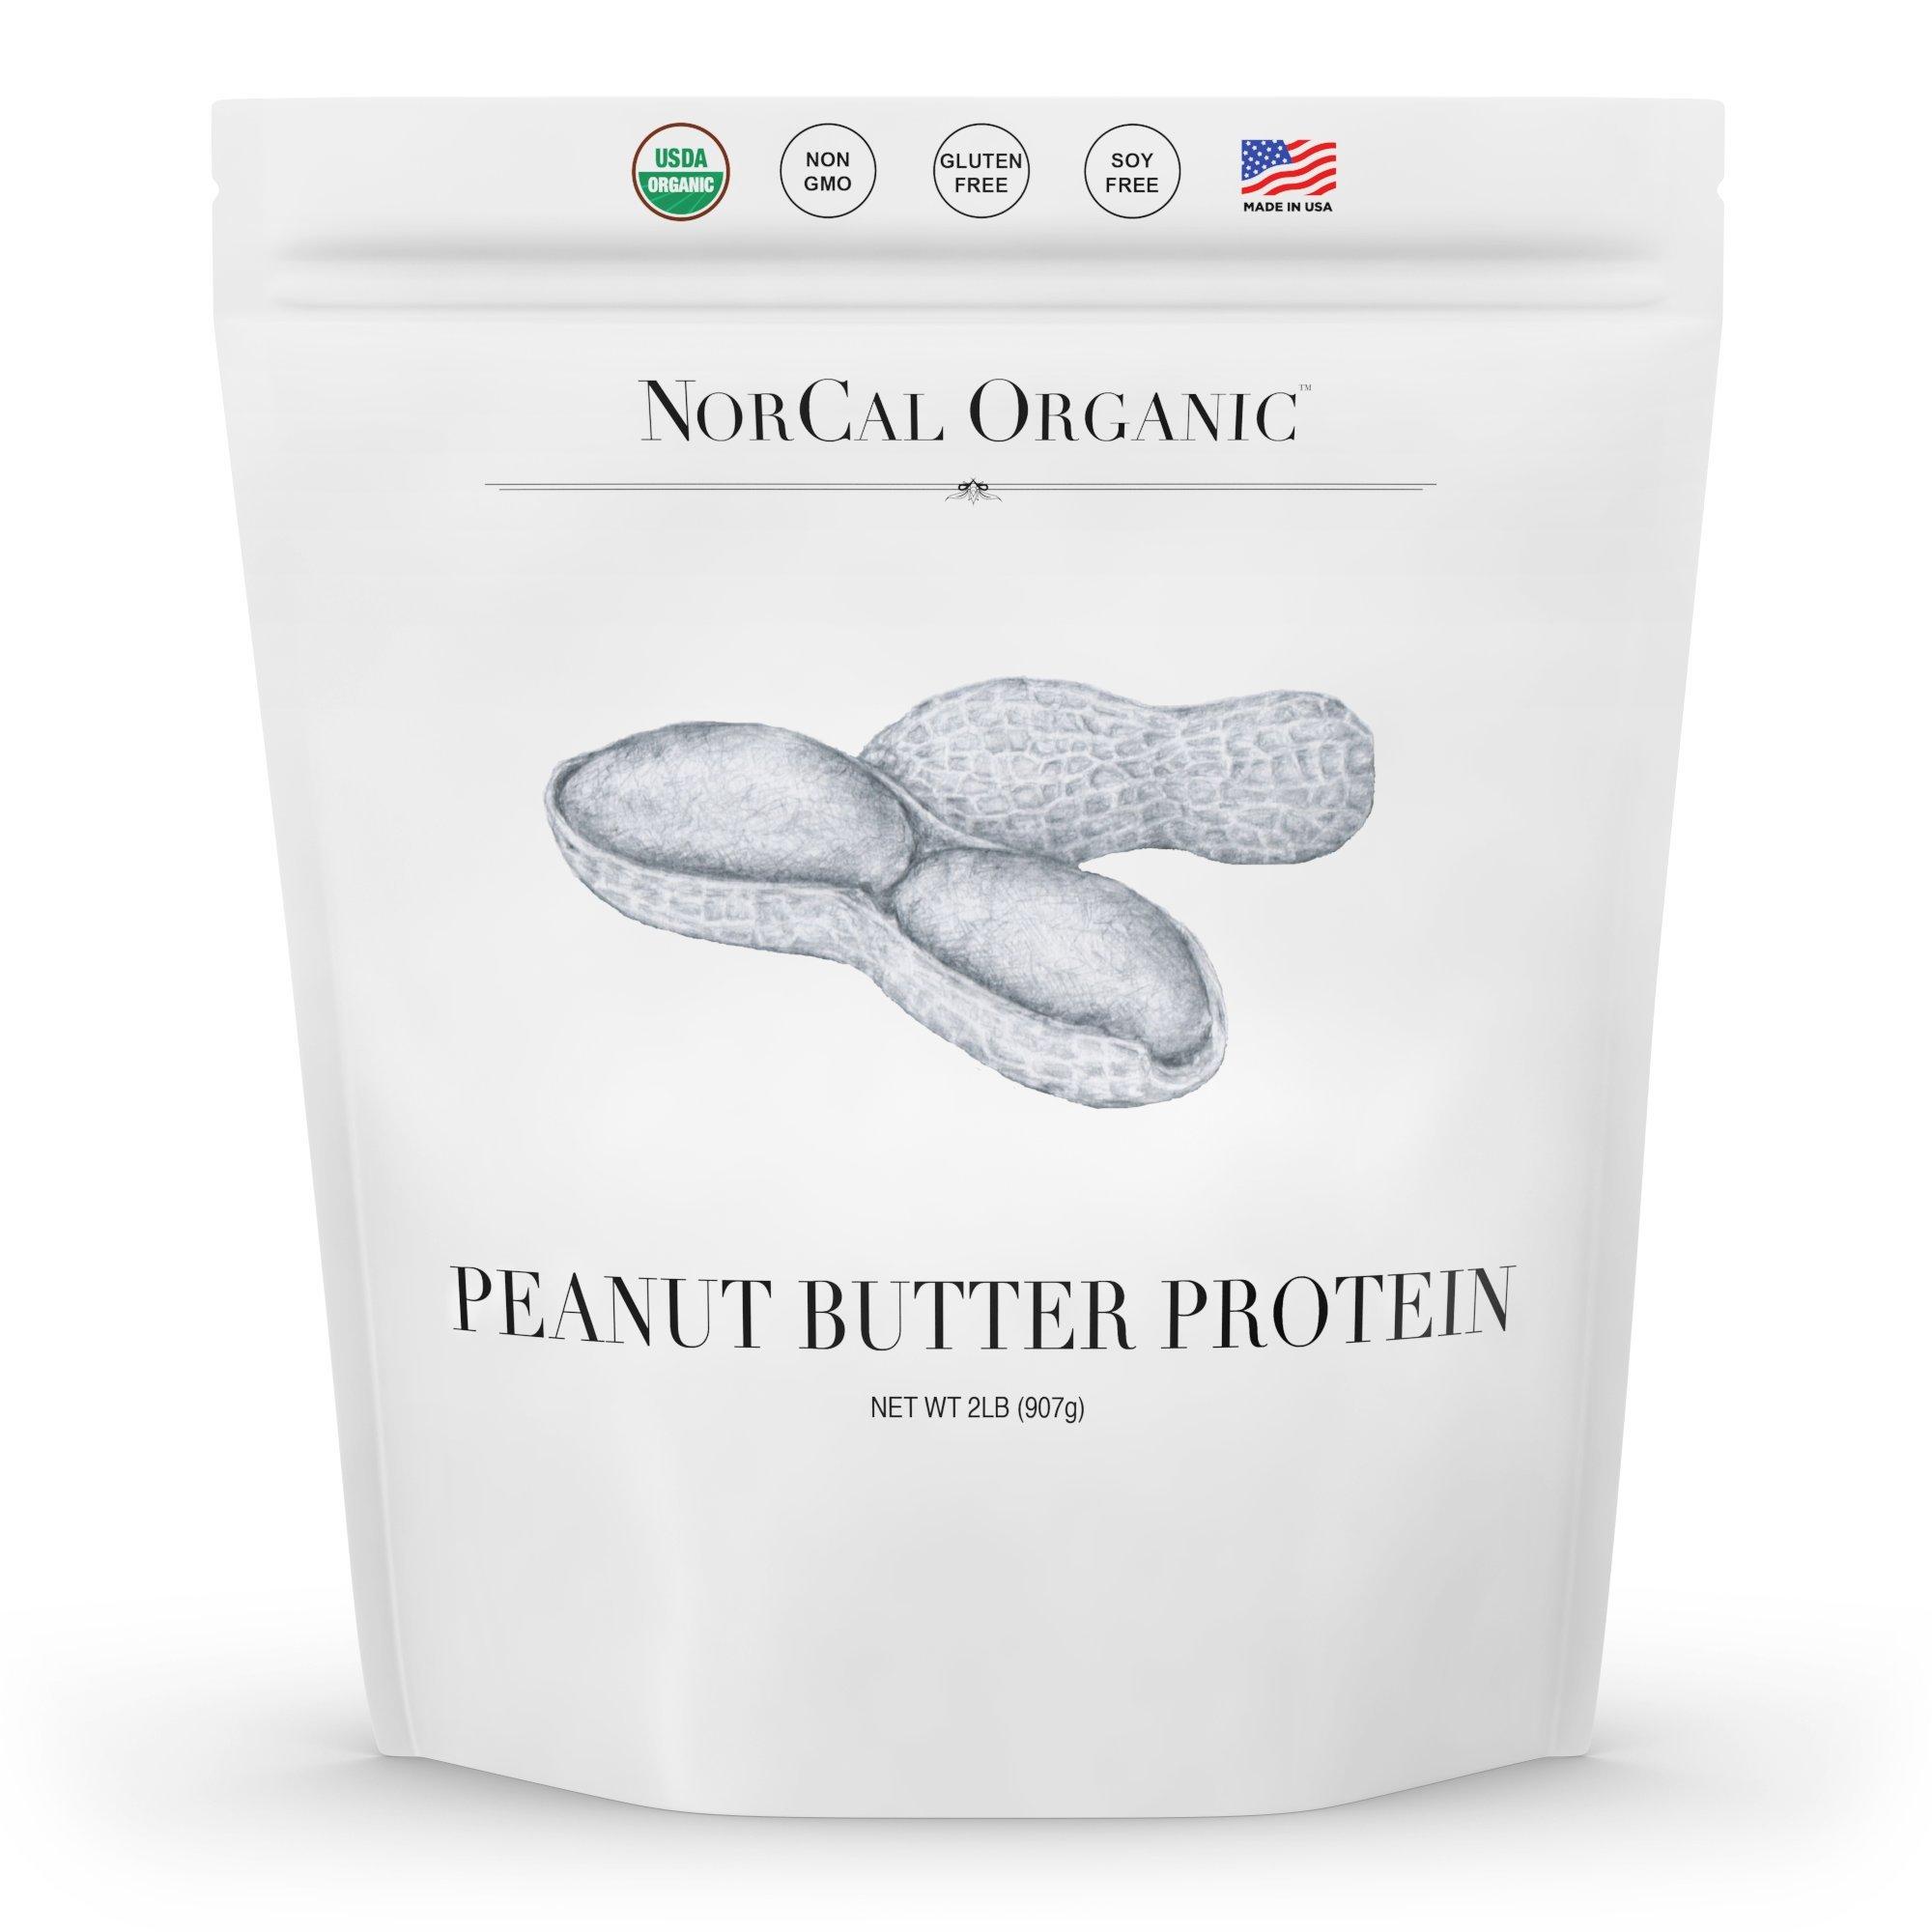 Norcal Organic Peanut Butter Powder, 2lb | 11g Protein, 100 Calories, 41 Servings | Vegan, Natural, Organic, Low Calorie, Source Organic by Source Organic